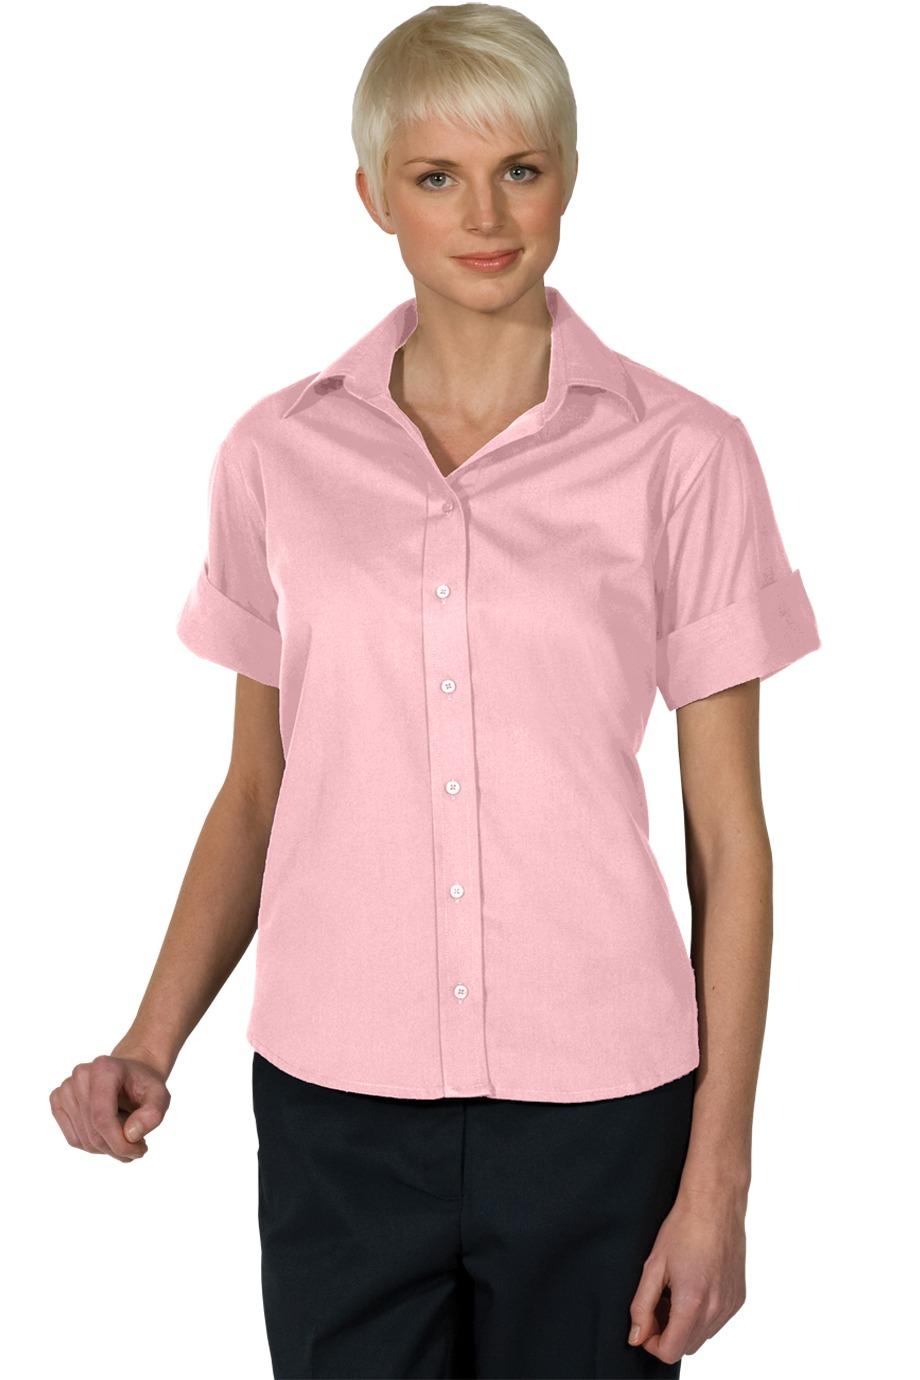 Edwards Garment 5245 - Women's Open Neck Poplin Short ...